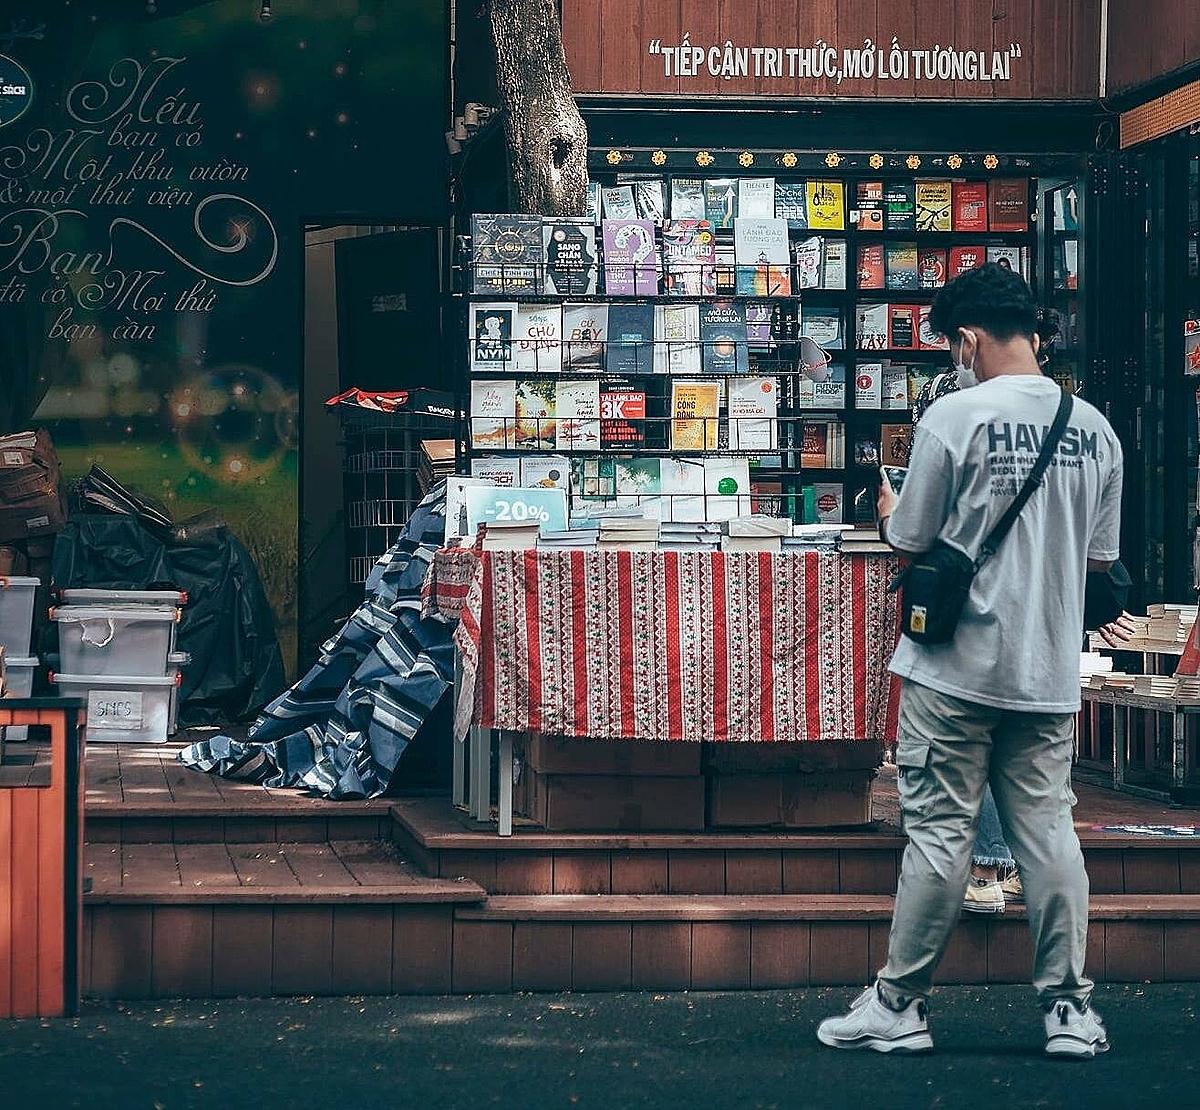 Nguyen Van Binh Book Street on Oct.10, 2021. Photo courtesy of Nguyen Danh